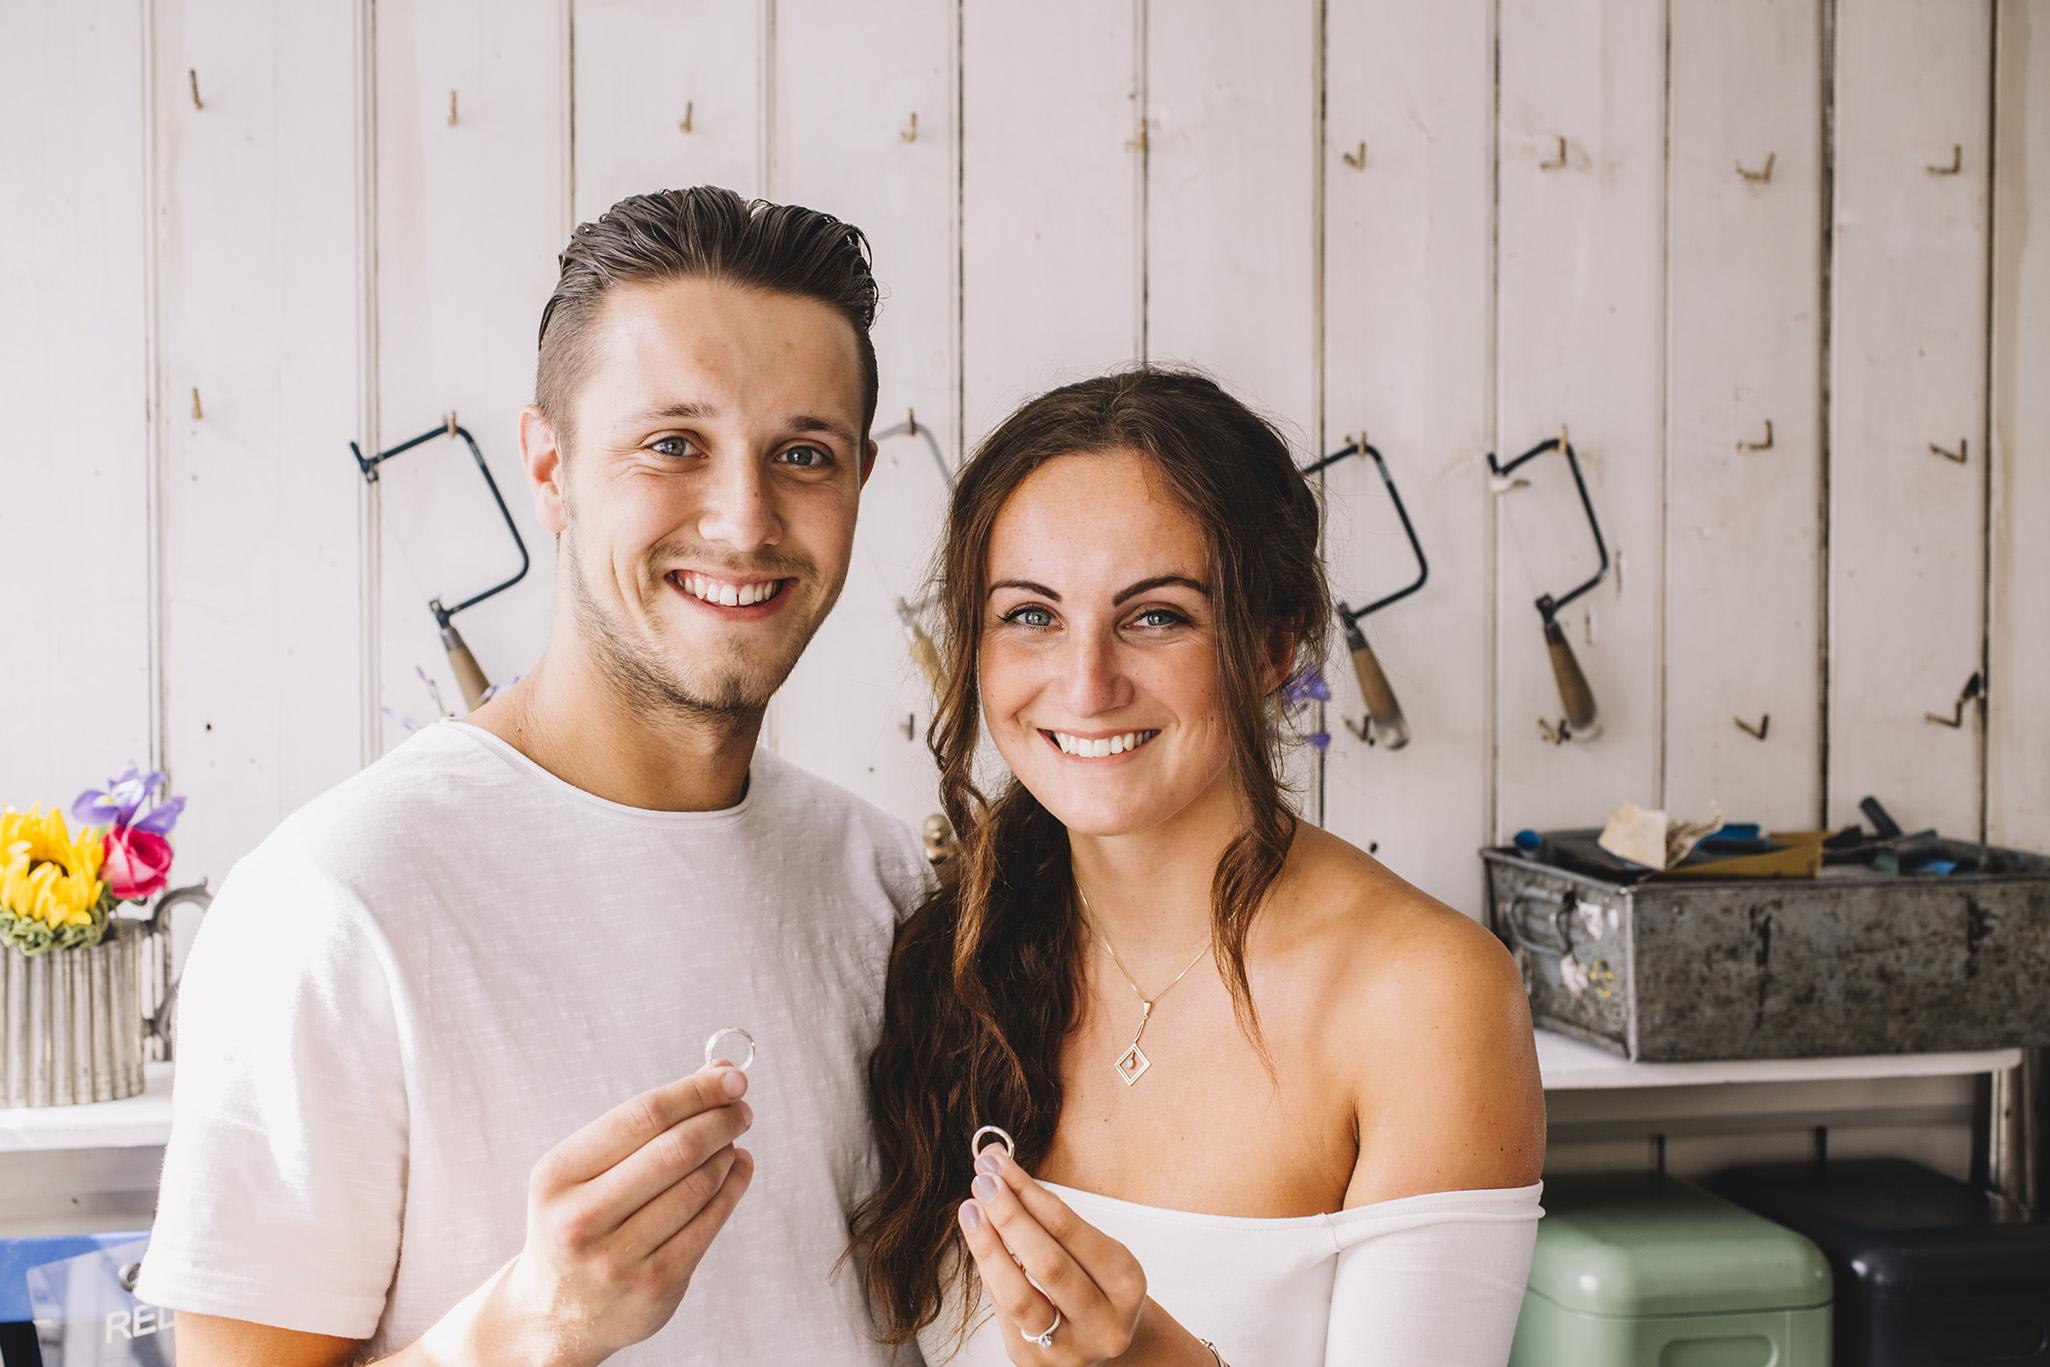 made-our-wedding-rings-quarterworkshop.jpg